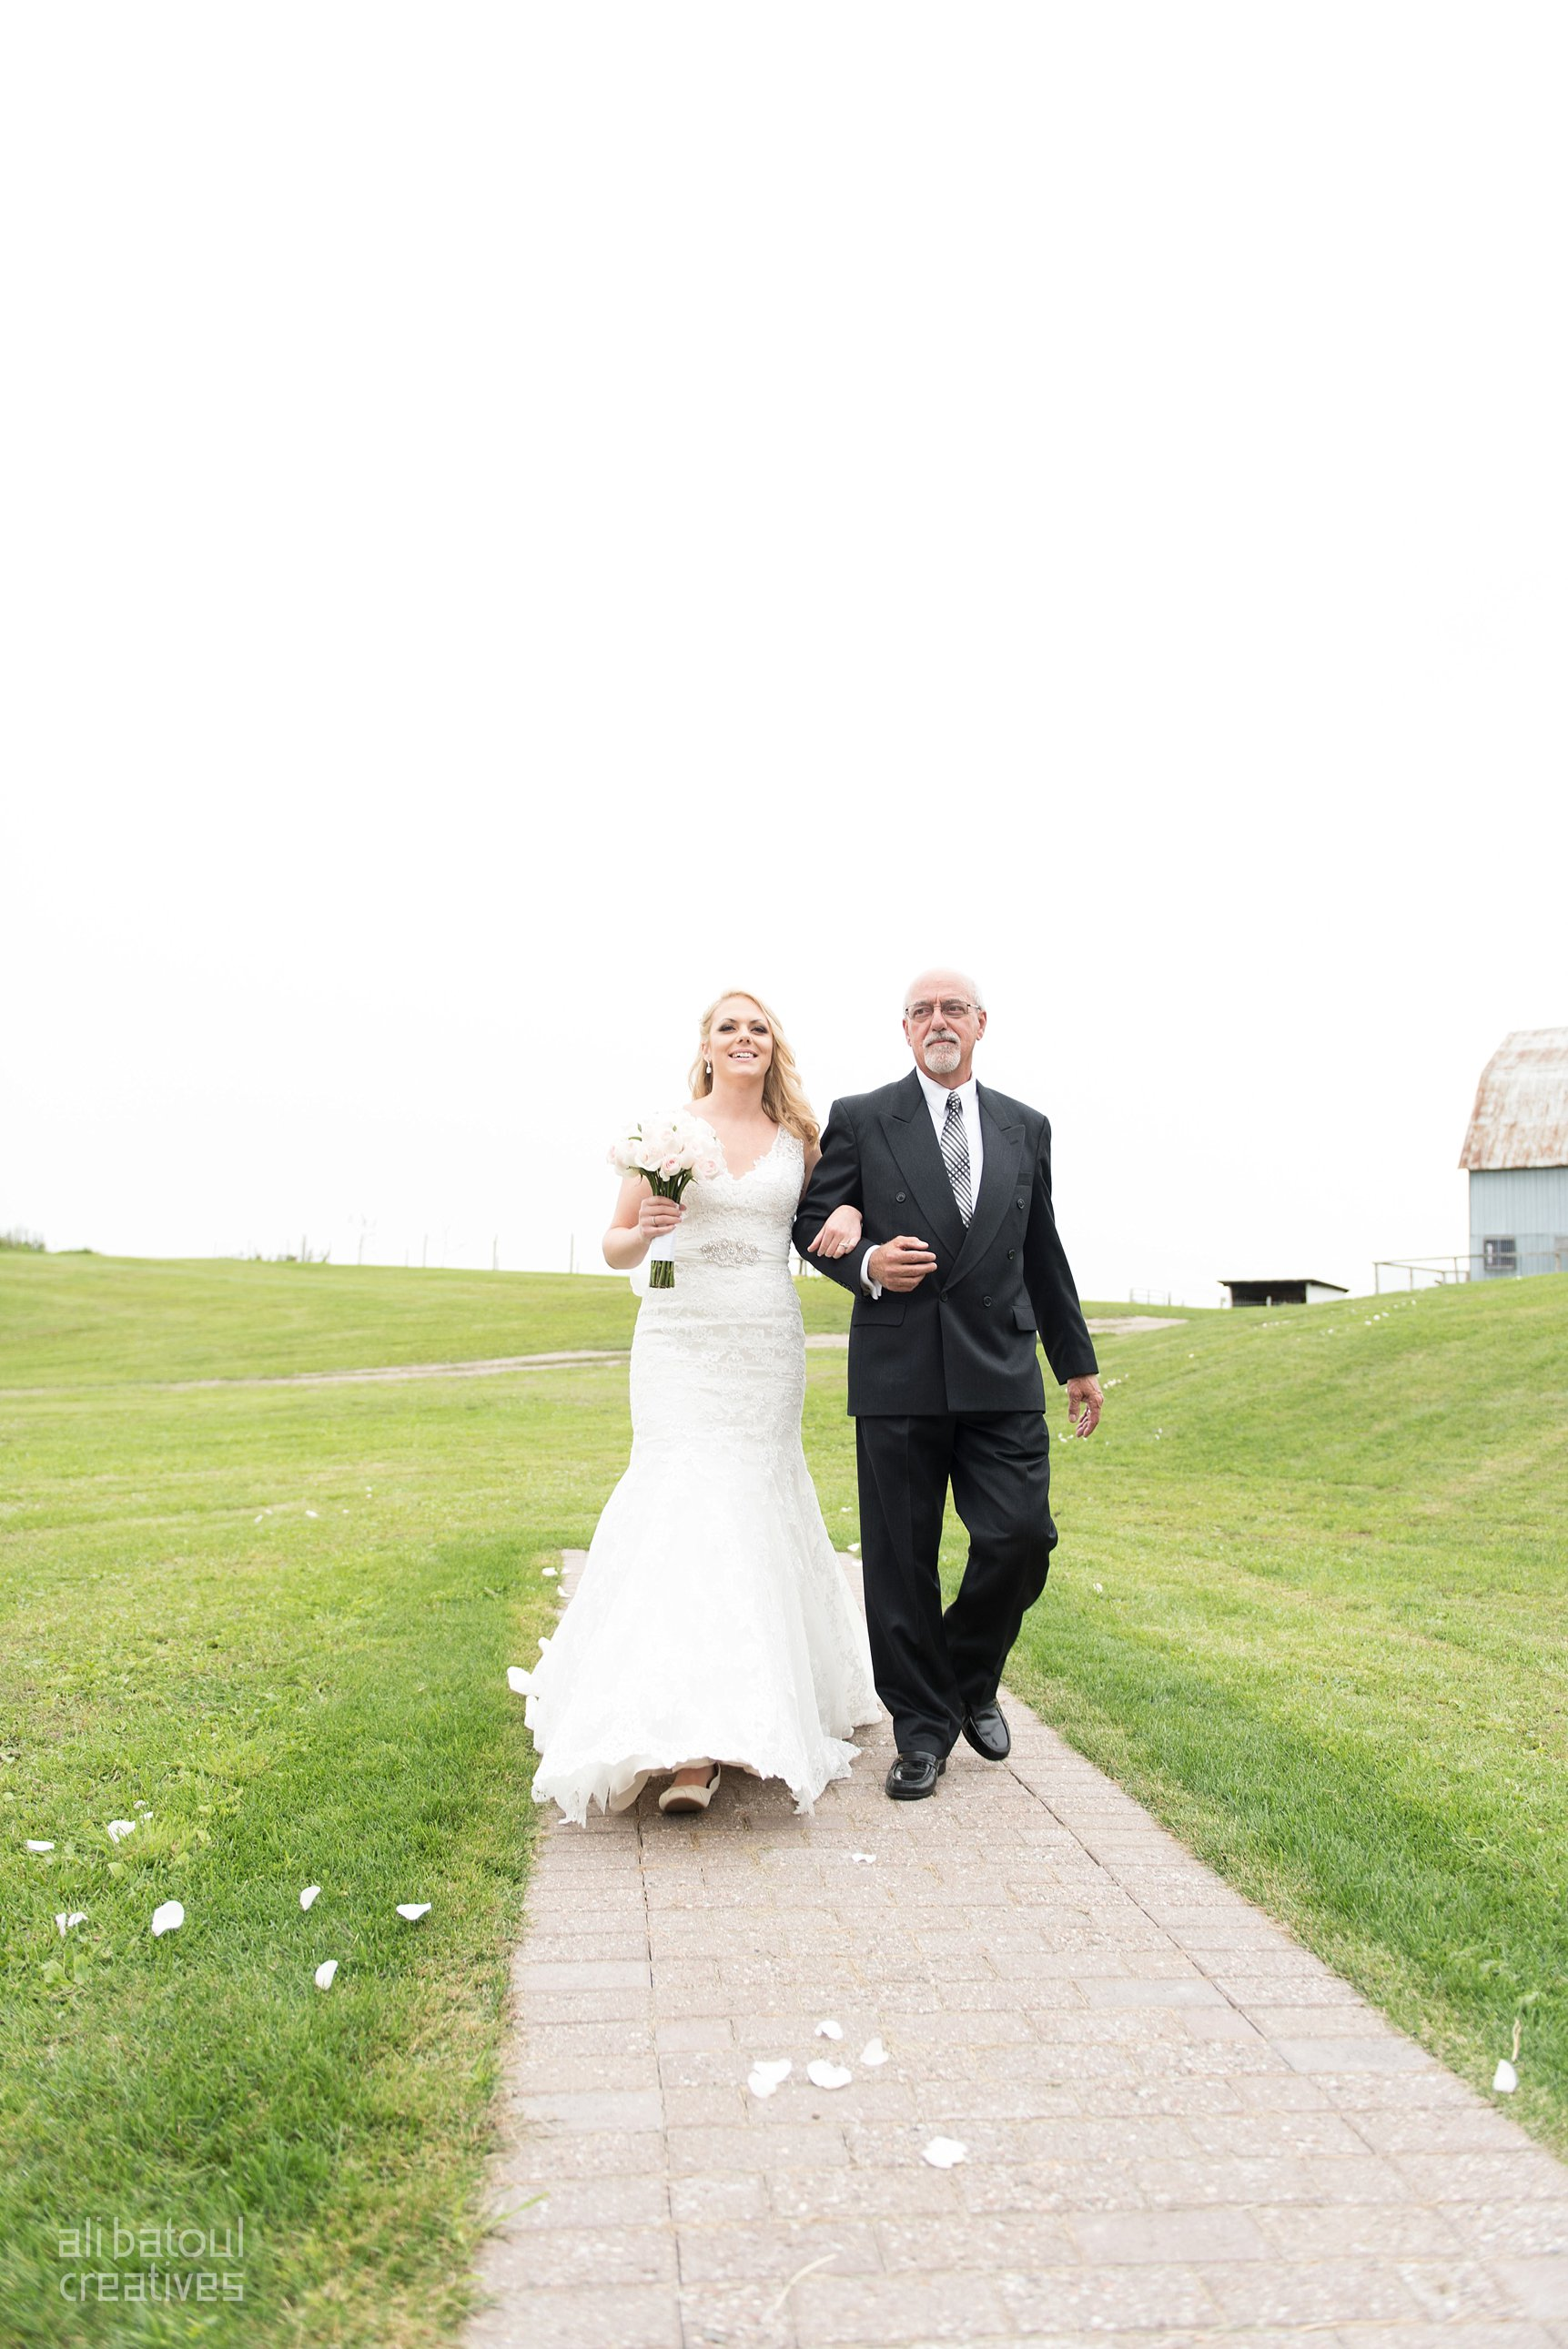 Samer + Brittany Barn Wedding - Ali Batoul Creatives (blog)-42_Stomped.jpg